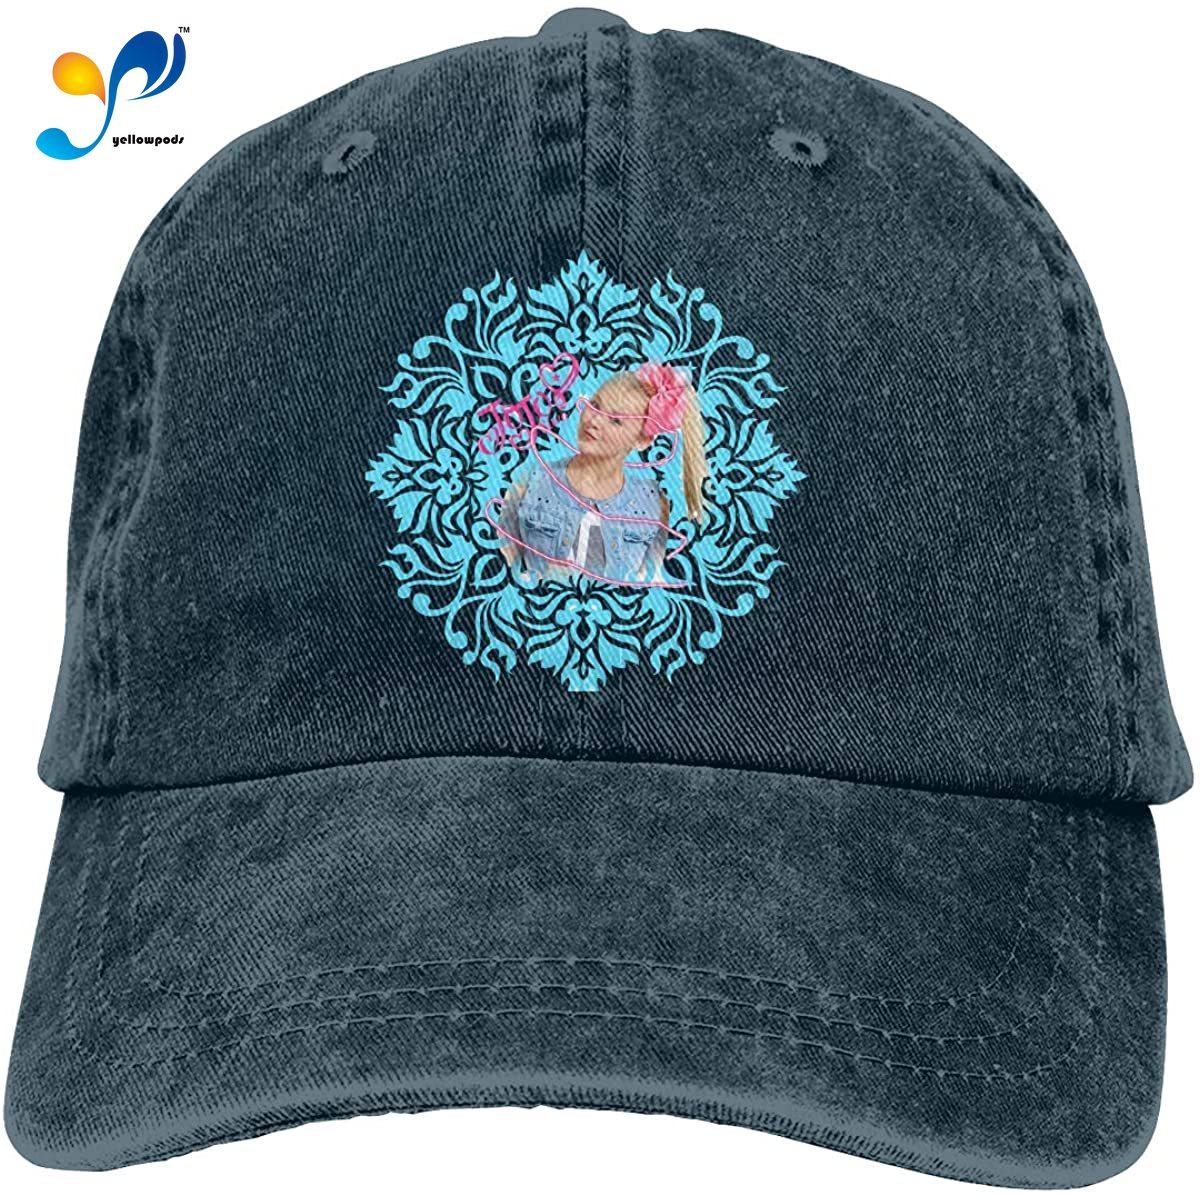 JoJo Siwa Commemorate Casquette Cap Vintage Adjustable Unisex Baseball Hat